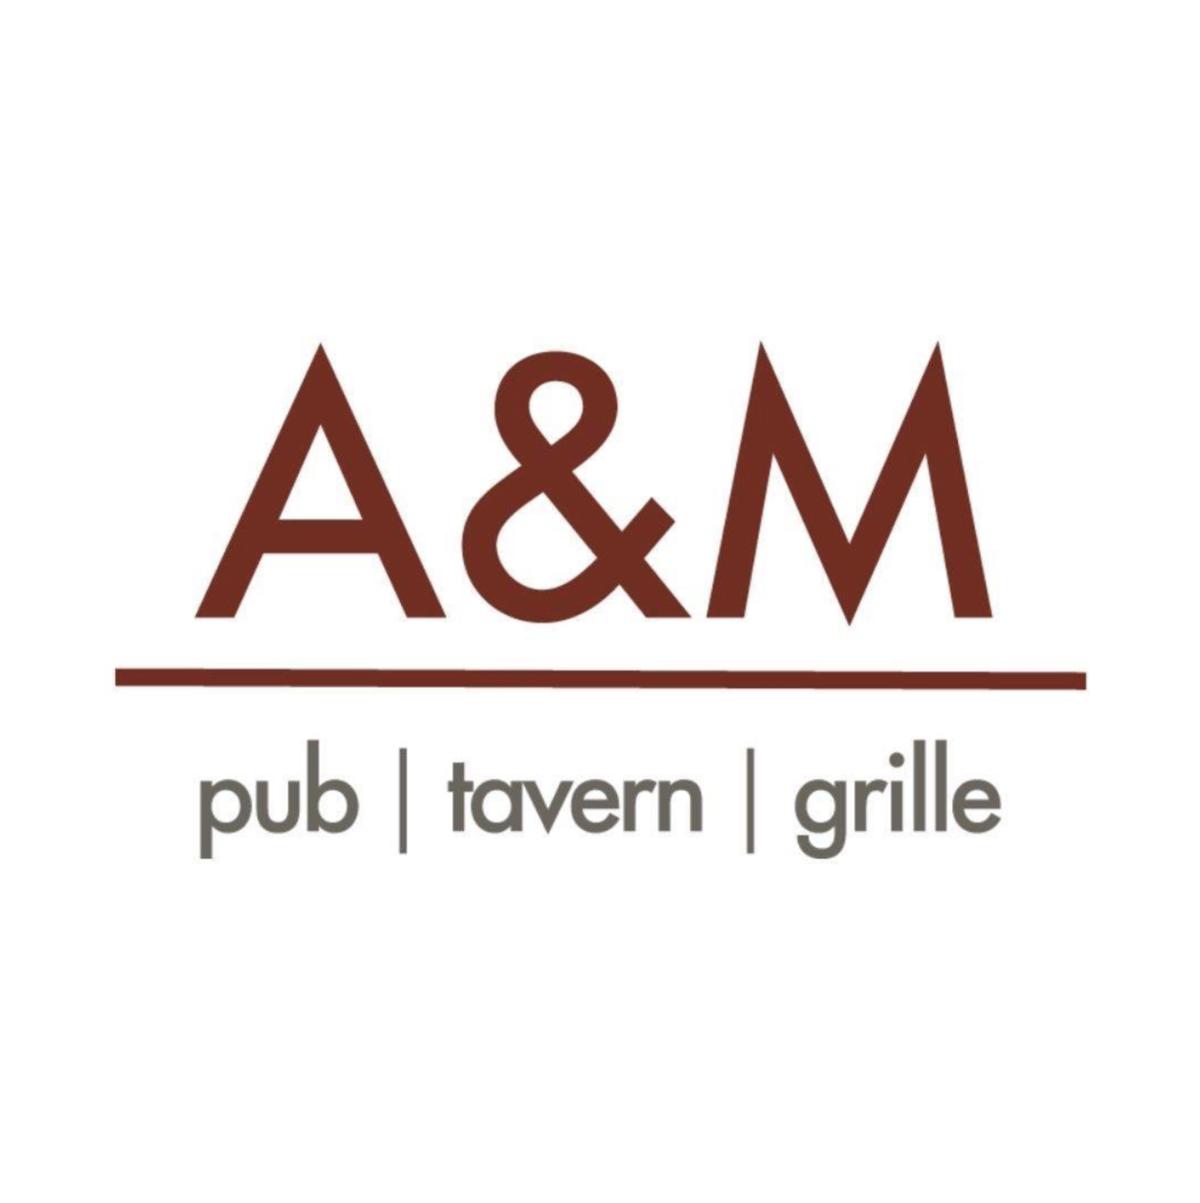 Aaron & Moses logo